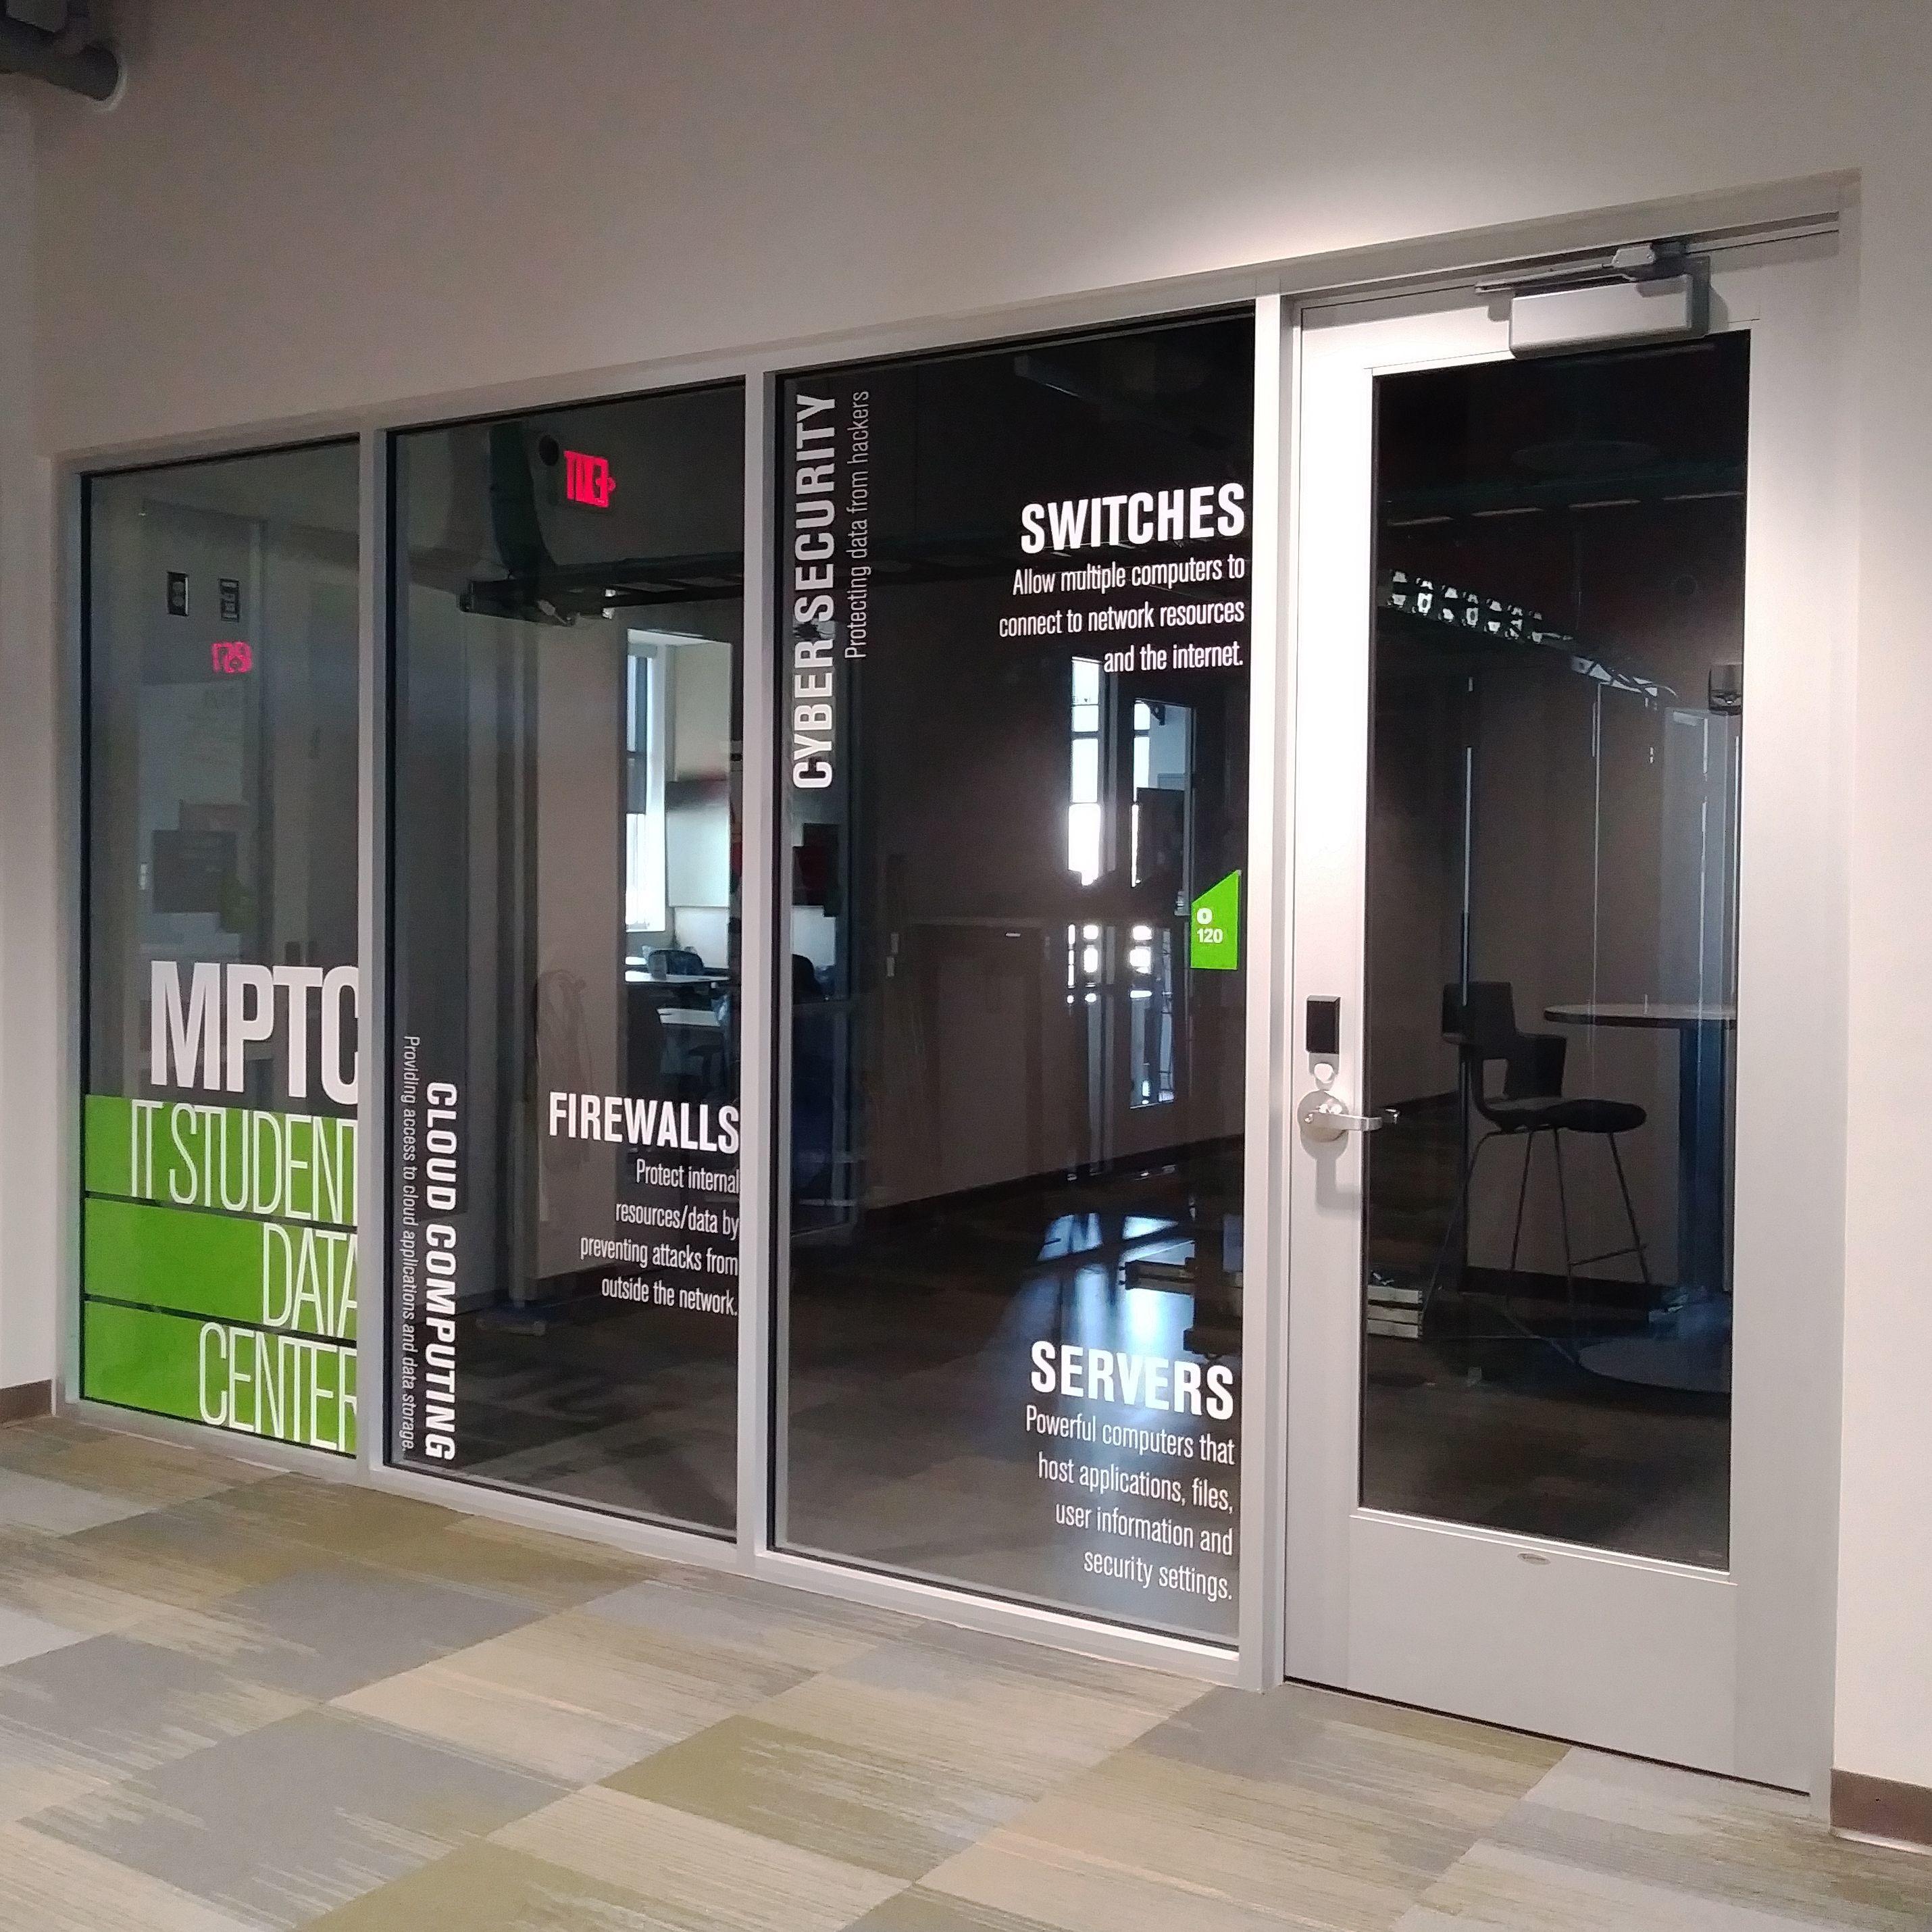 MPTC - Data